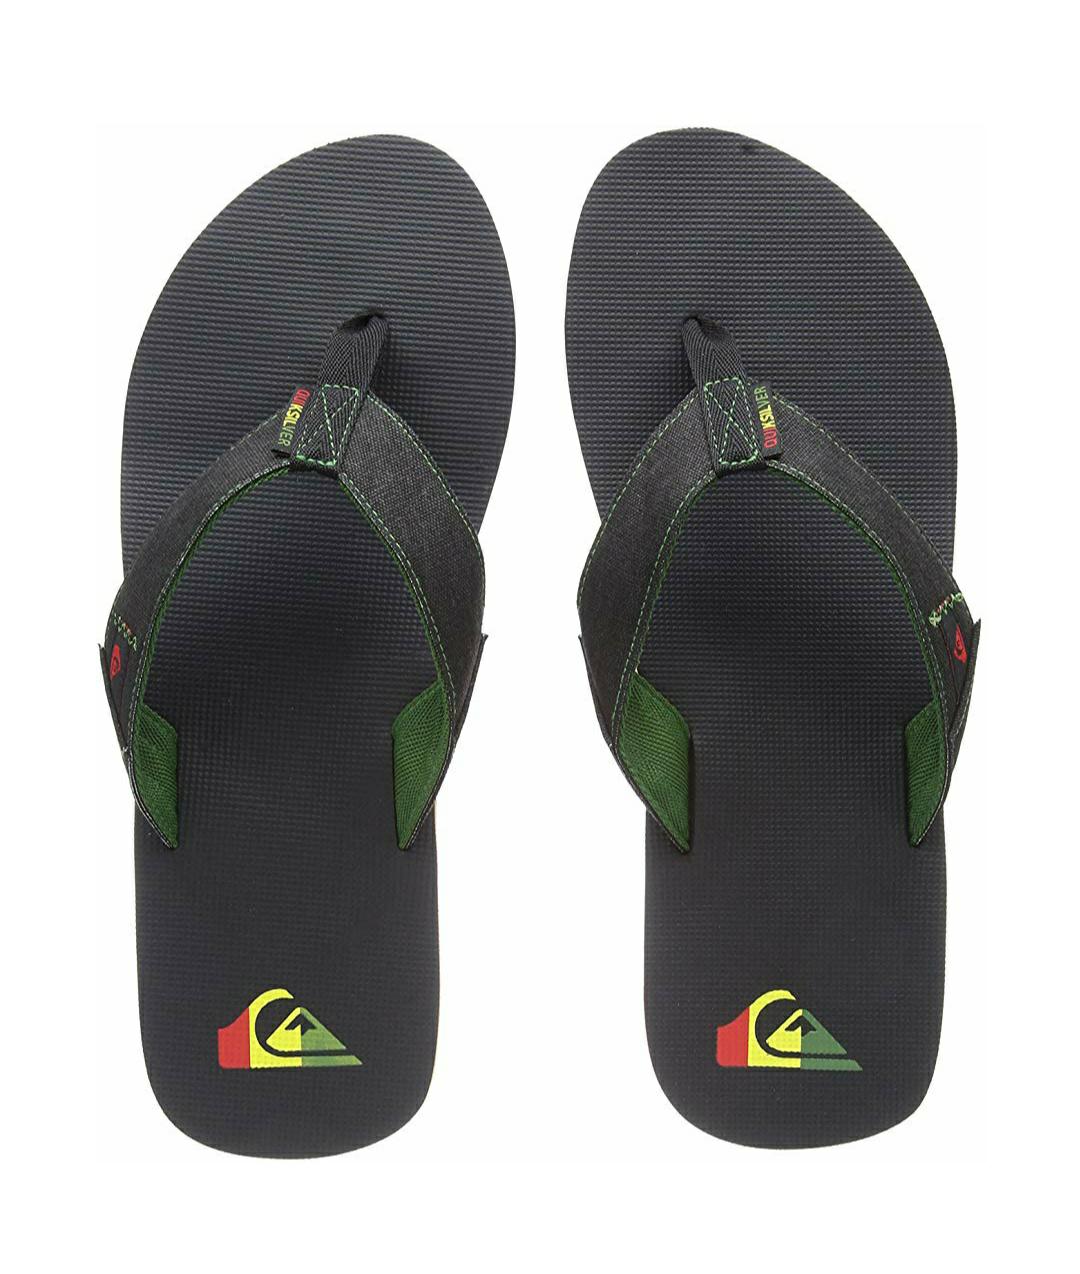 Sandalias de marca productos PLUS- EU 39 A PRECIOS DE RISA